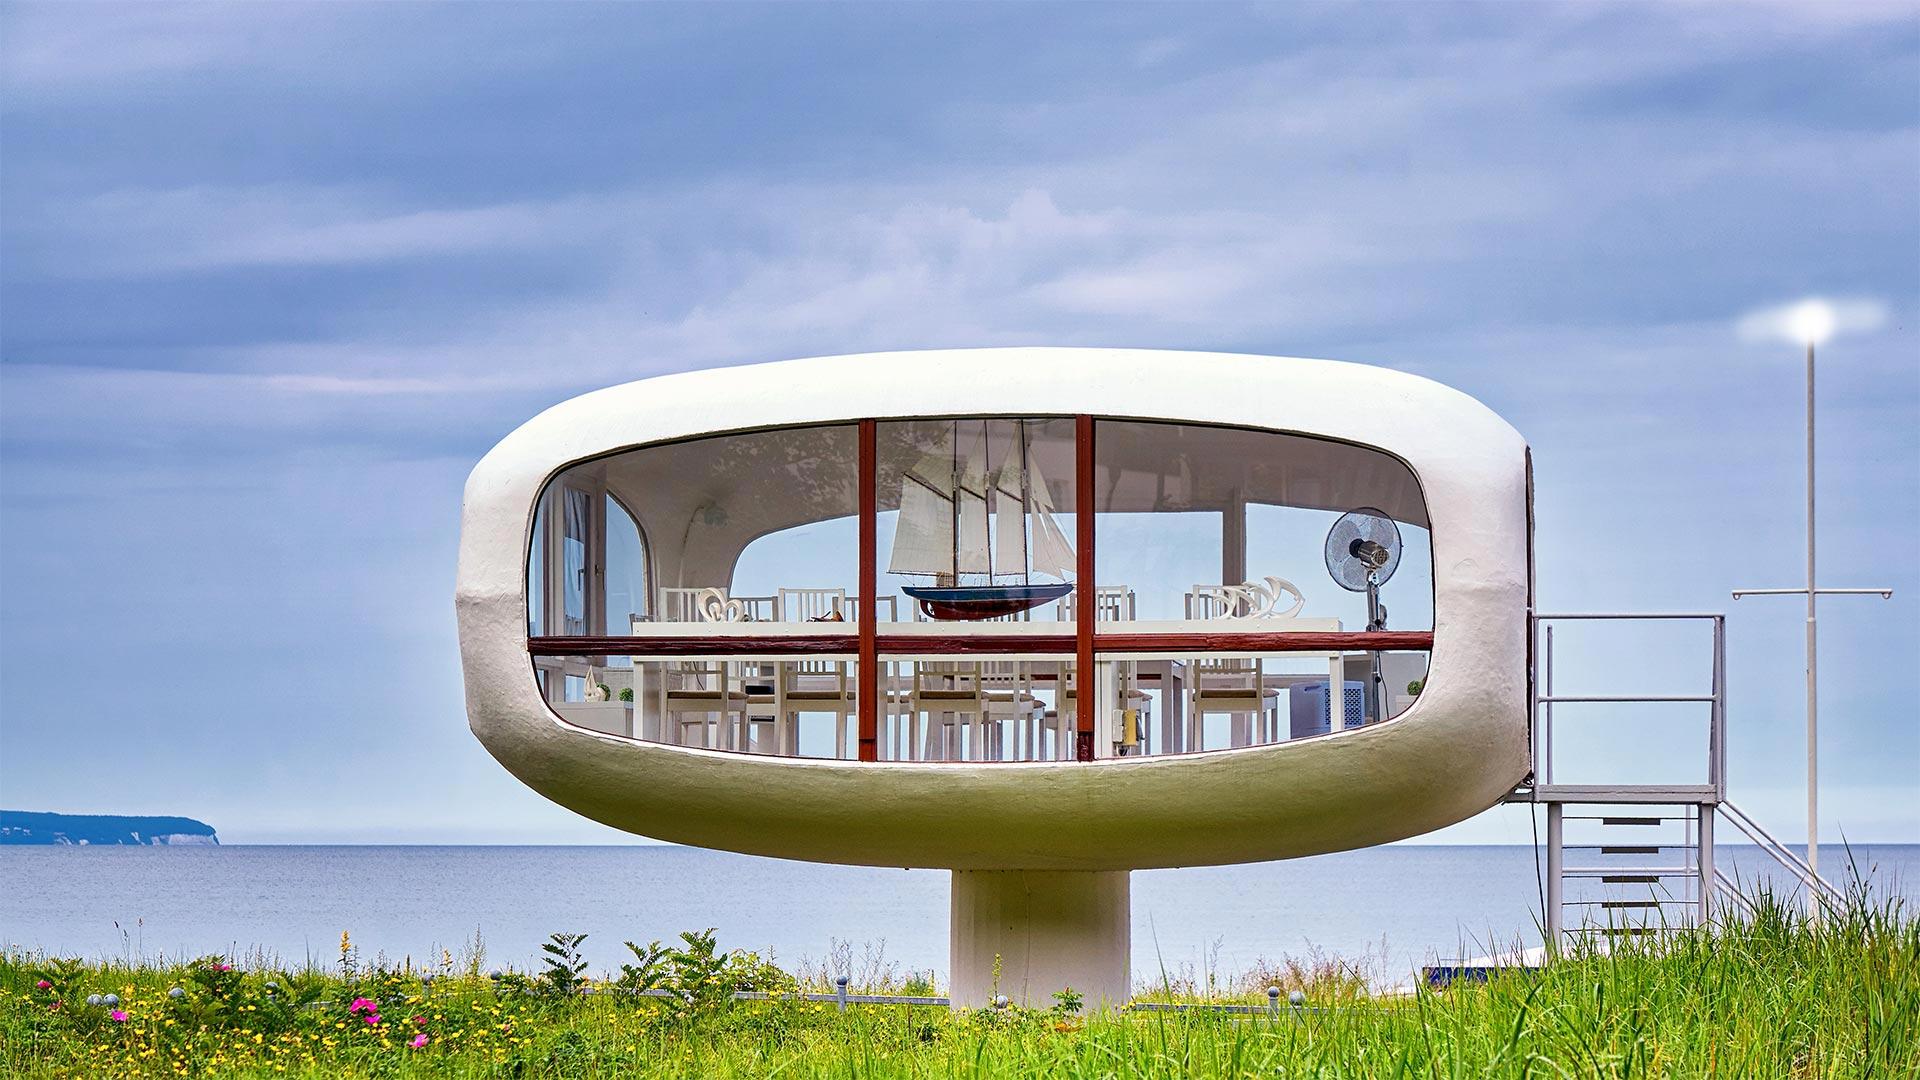 Former lifeguard station on the island of Rügen, Mecklenburg-Western Pomerania, Germany (© DR pics/Shutterstock)(Bing United States)